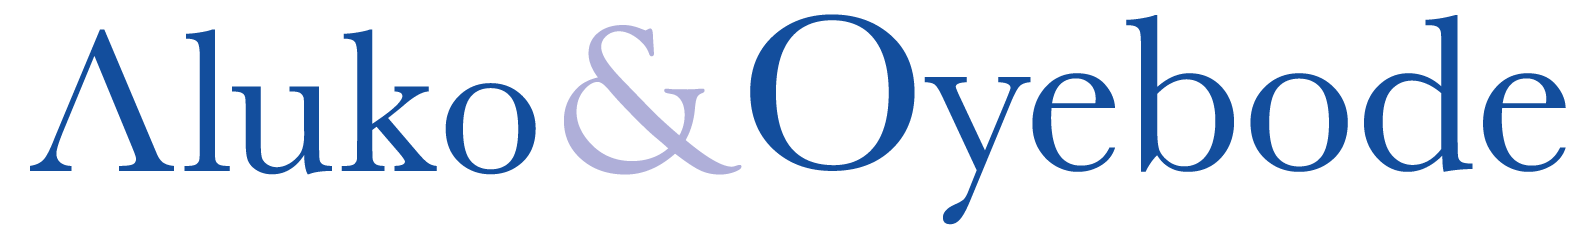 A&O_logo_colour_white-01.png